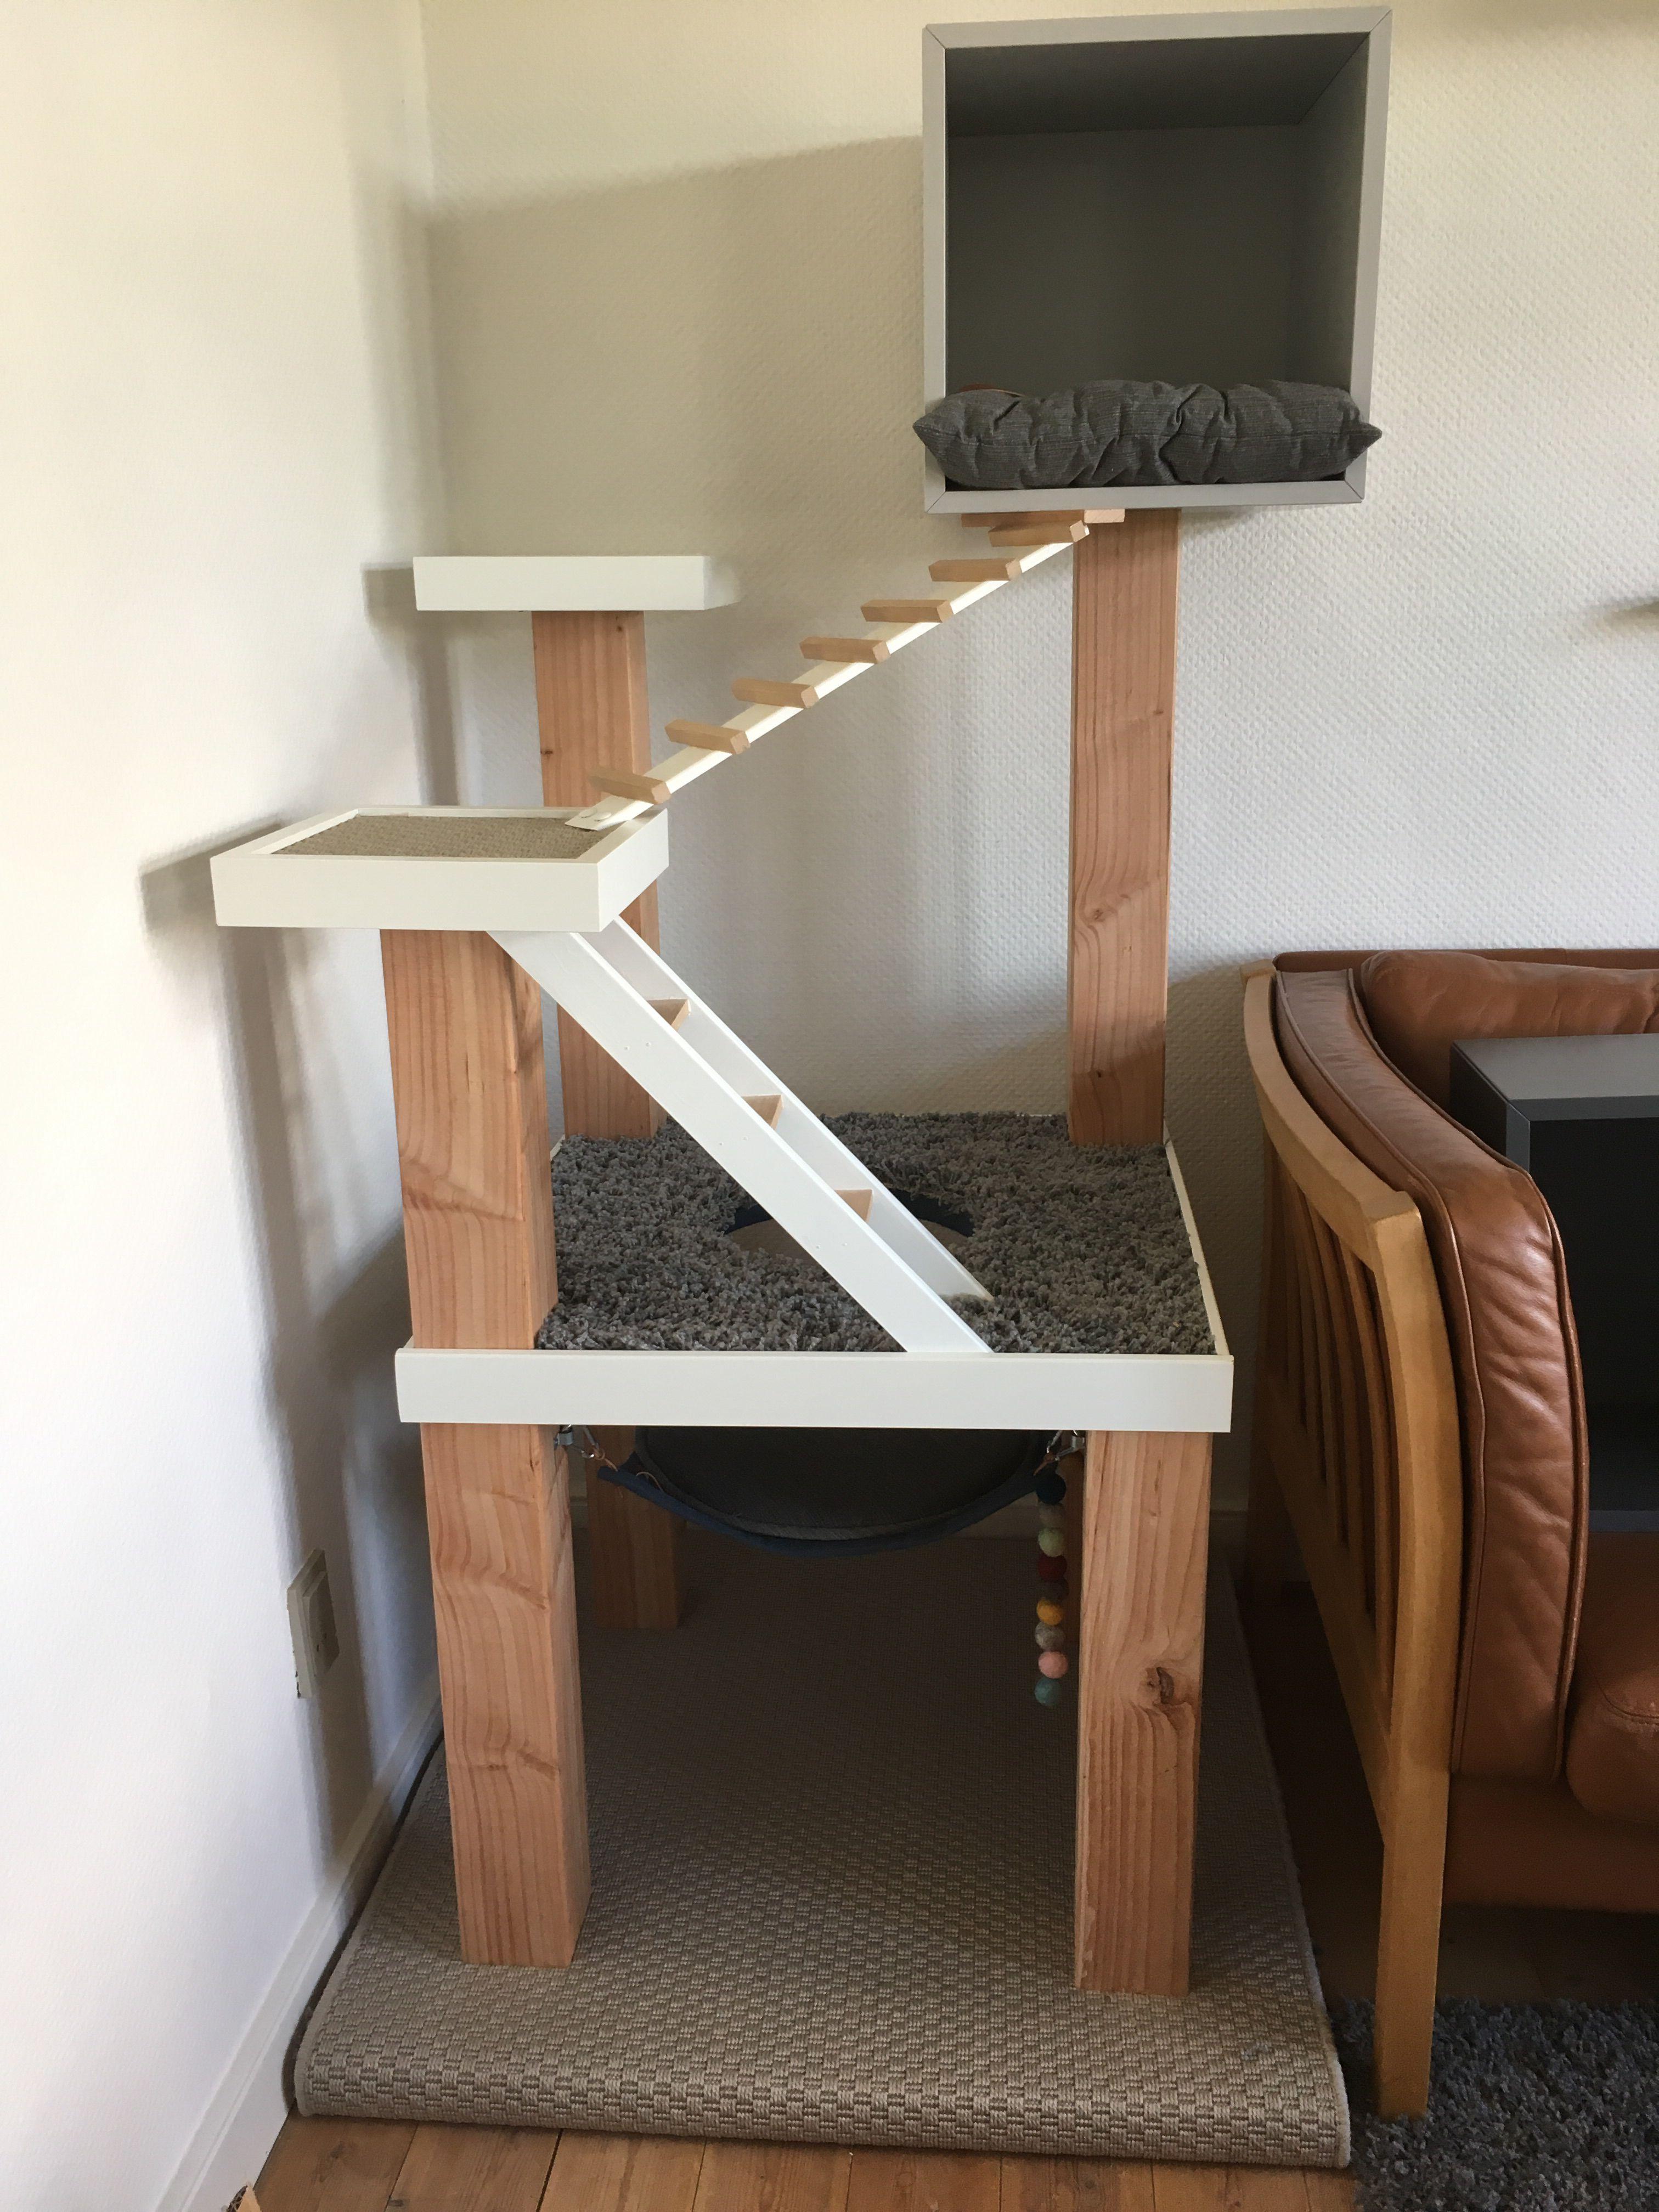 Diy Cat Tree Ikea Eket Stairs Hammock Gatos Arbol